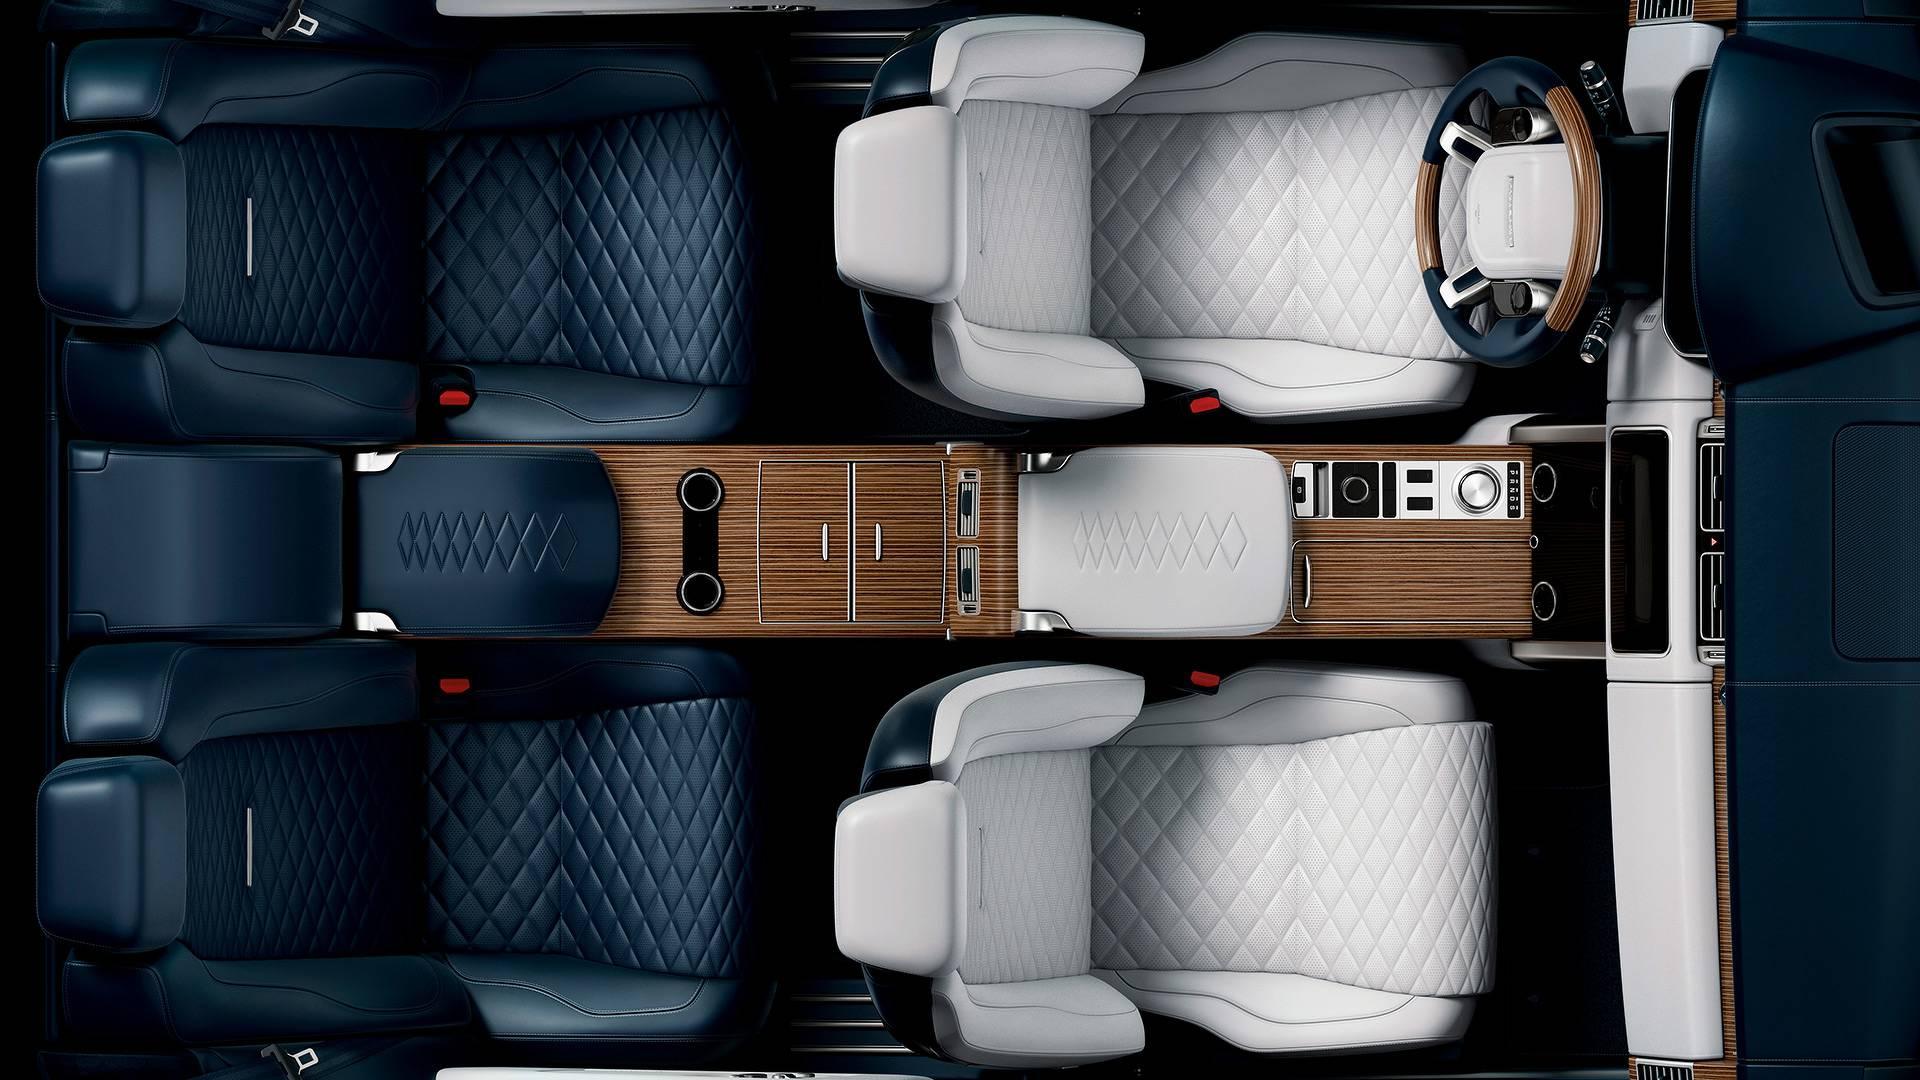 2019-land-rover-range-rover-sv-coupe (5).jpg